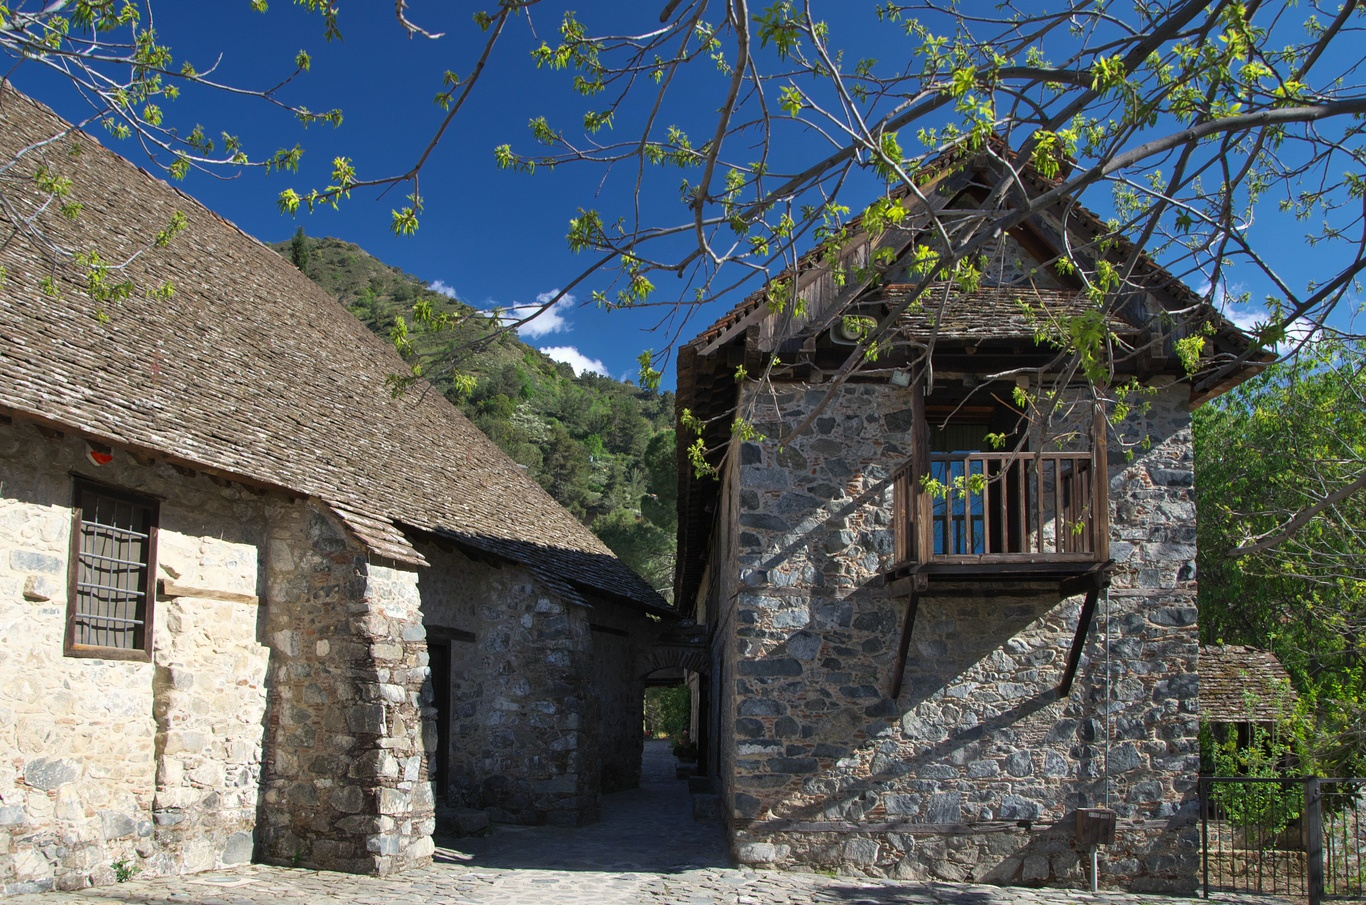 Klášter Agios Ioannis Lambadistis v obci Kalopanagiotis